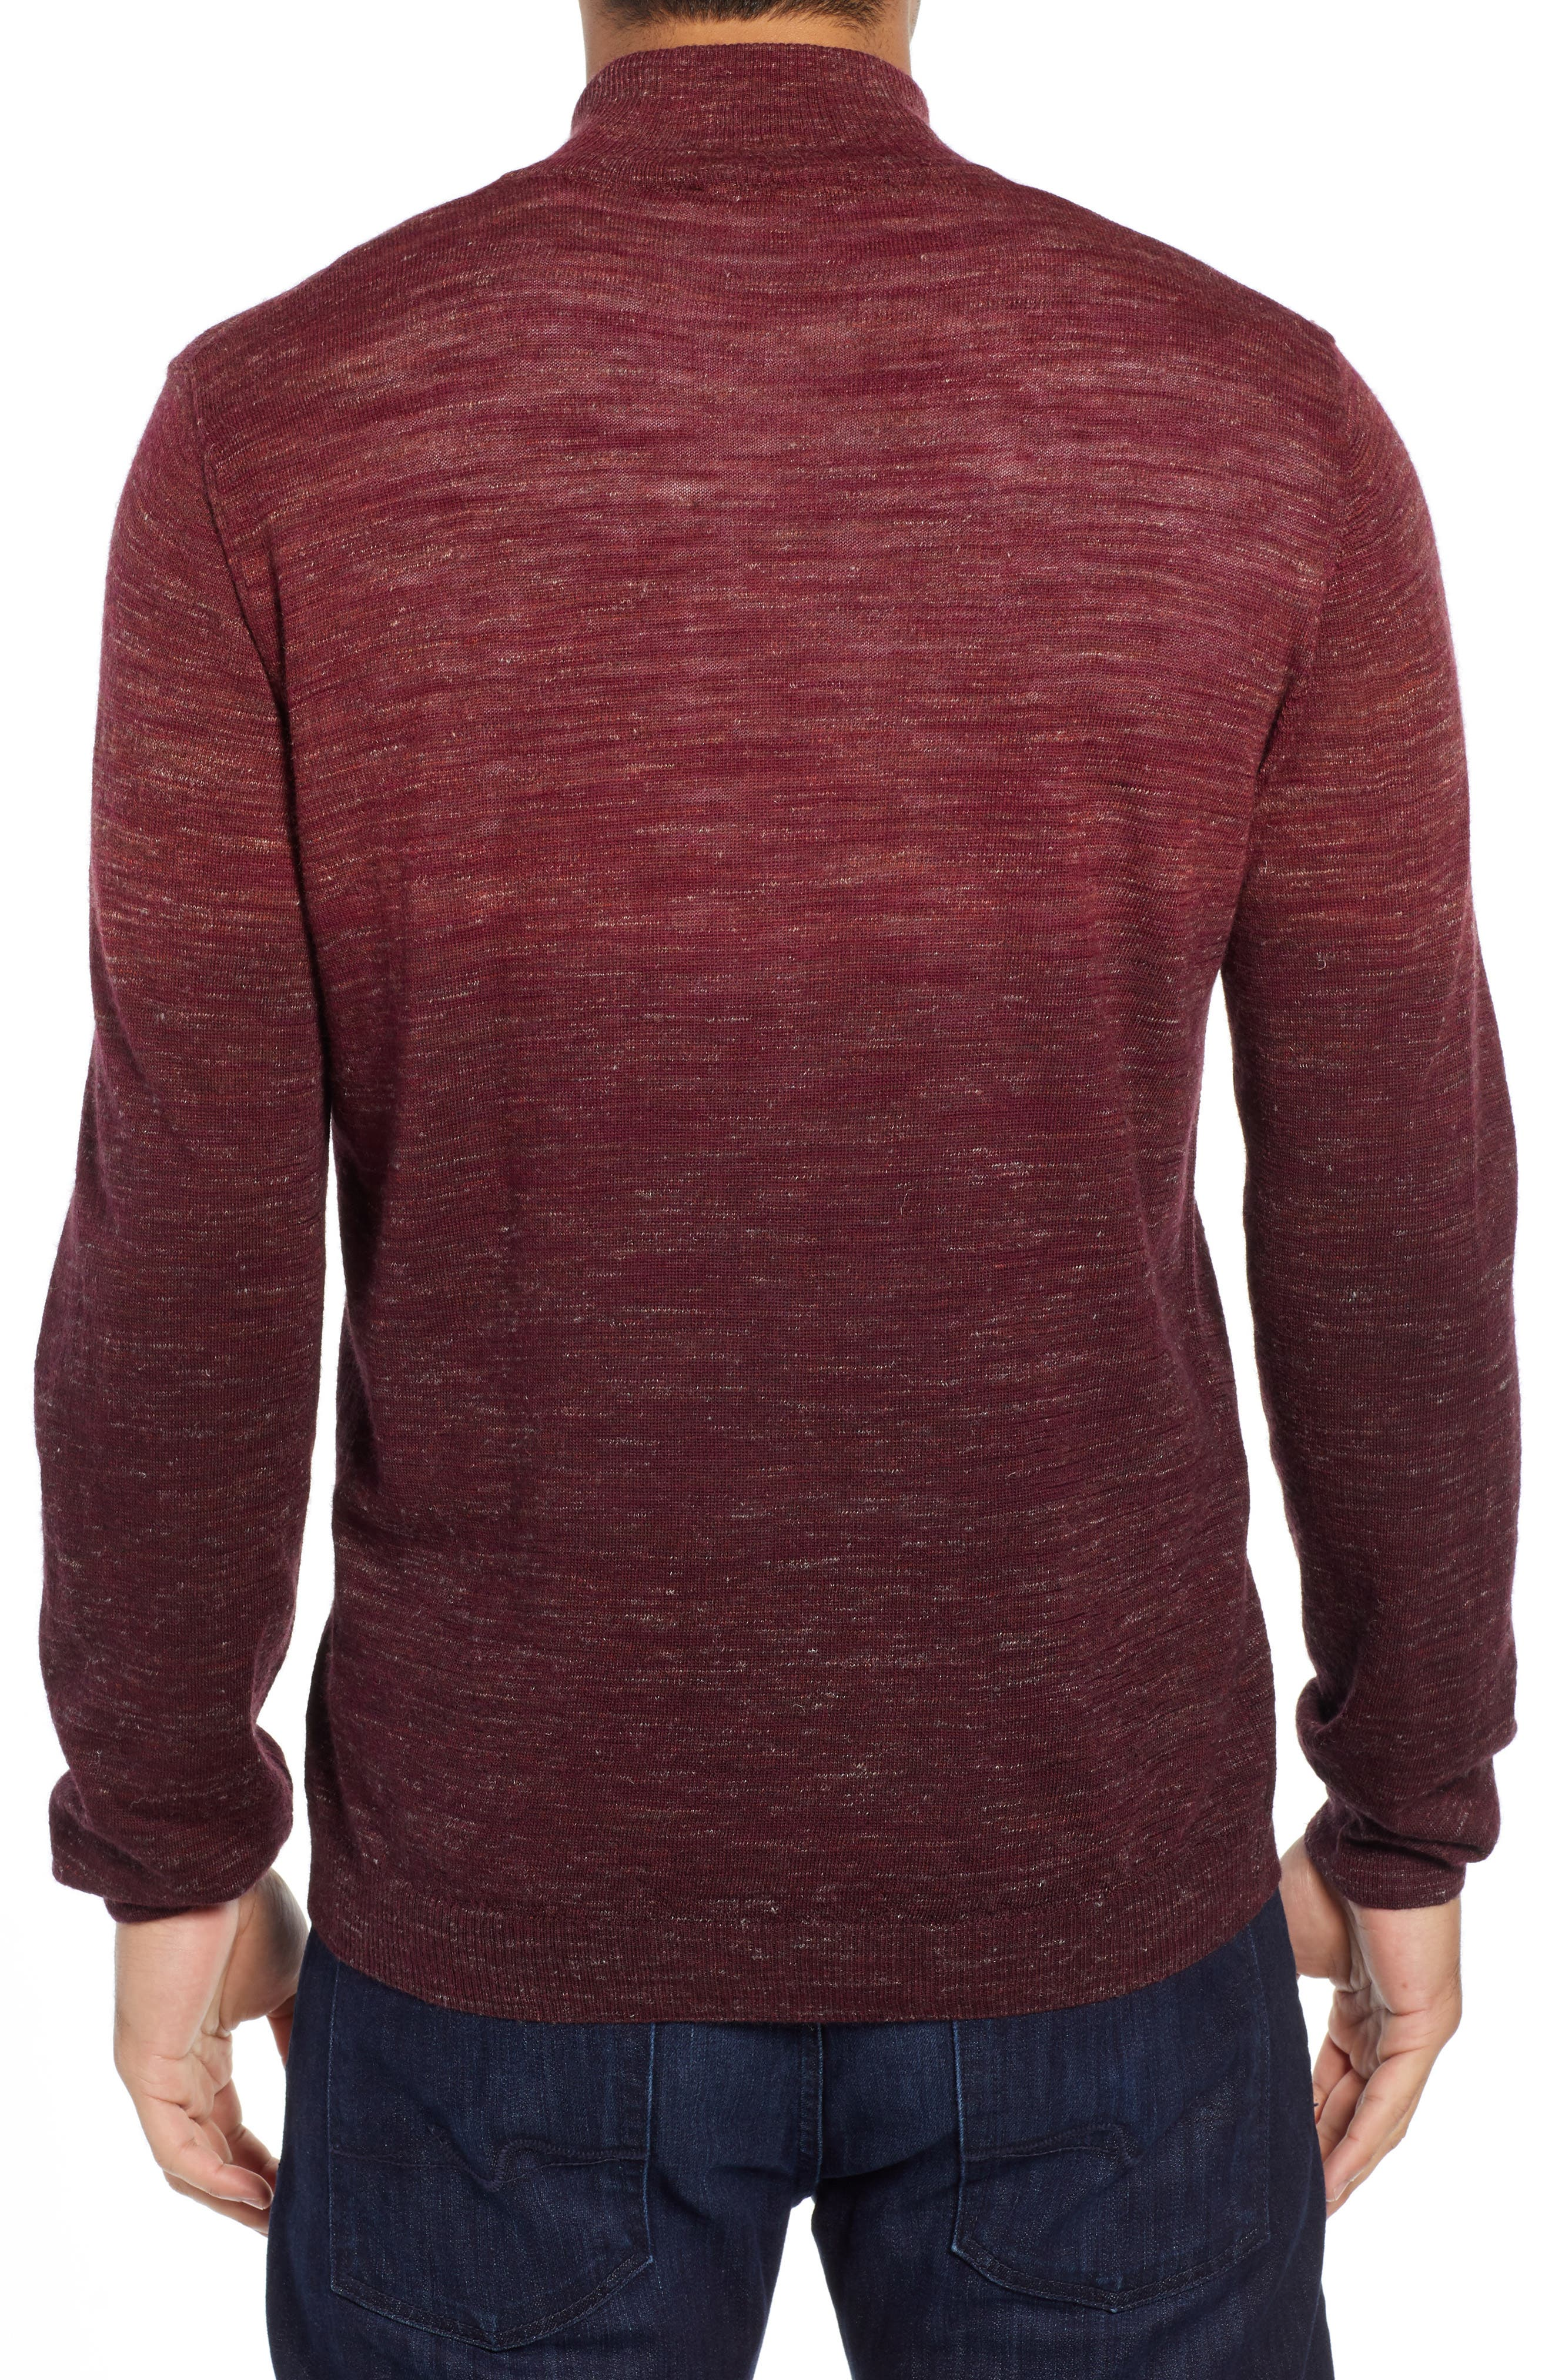 Quarter Zip Pullover,                             Alternate thumbnail 2, color,                             WINE